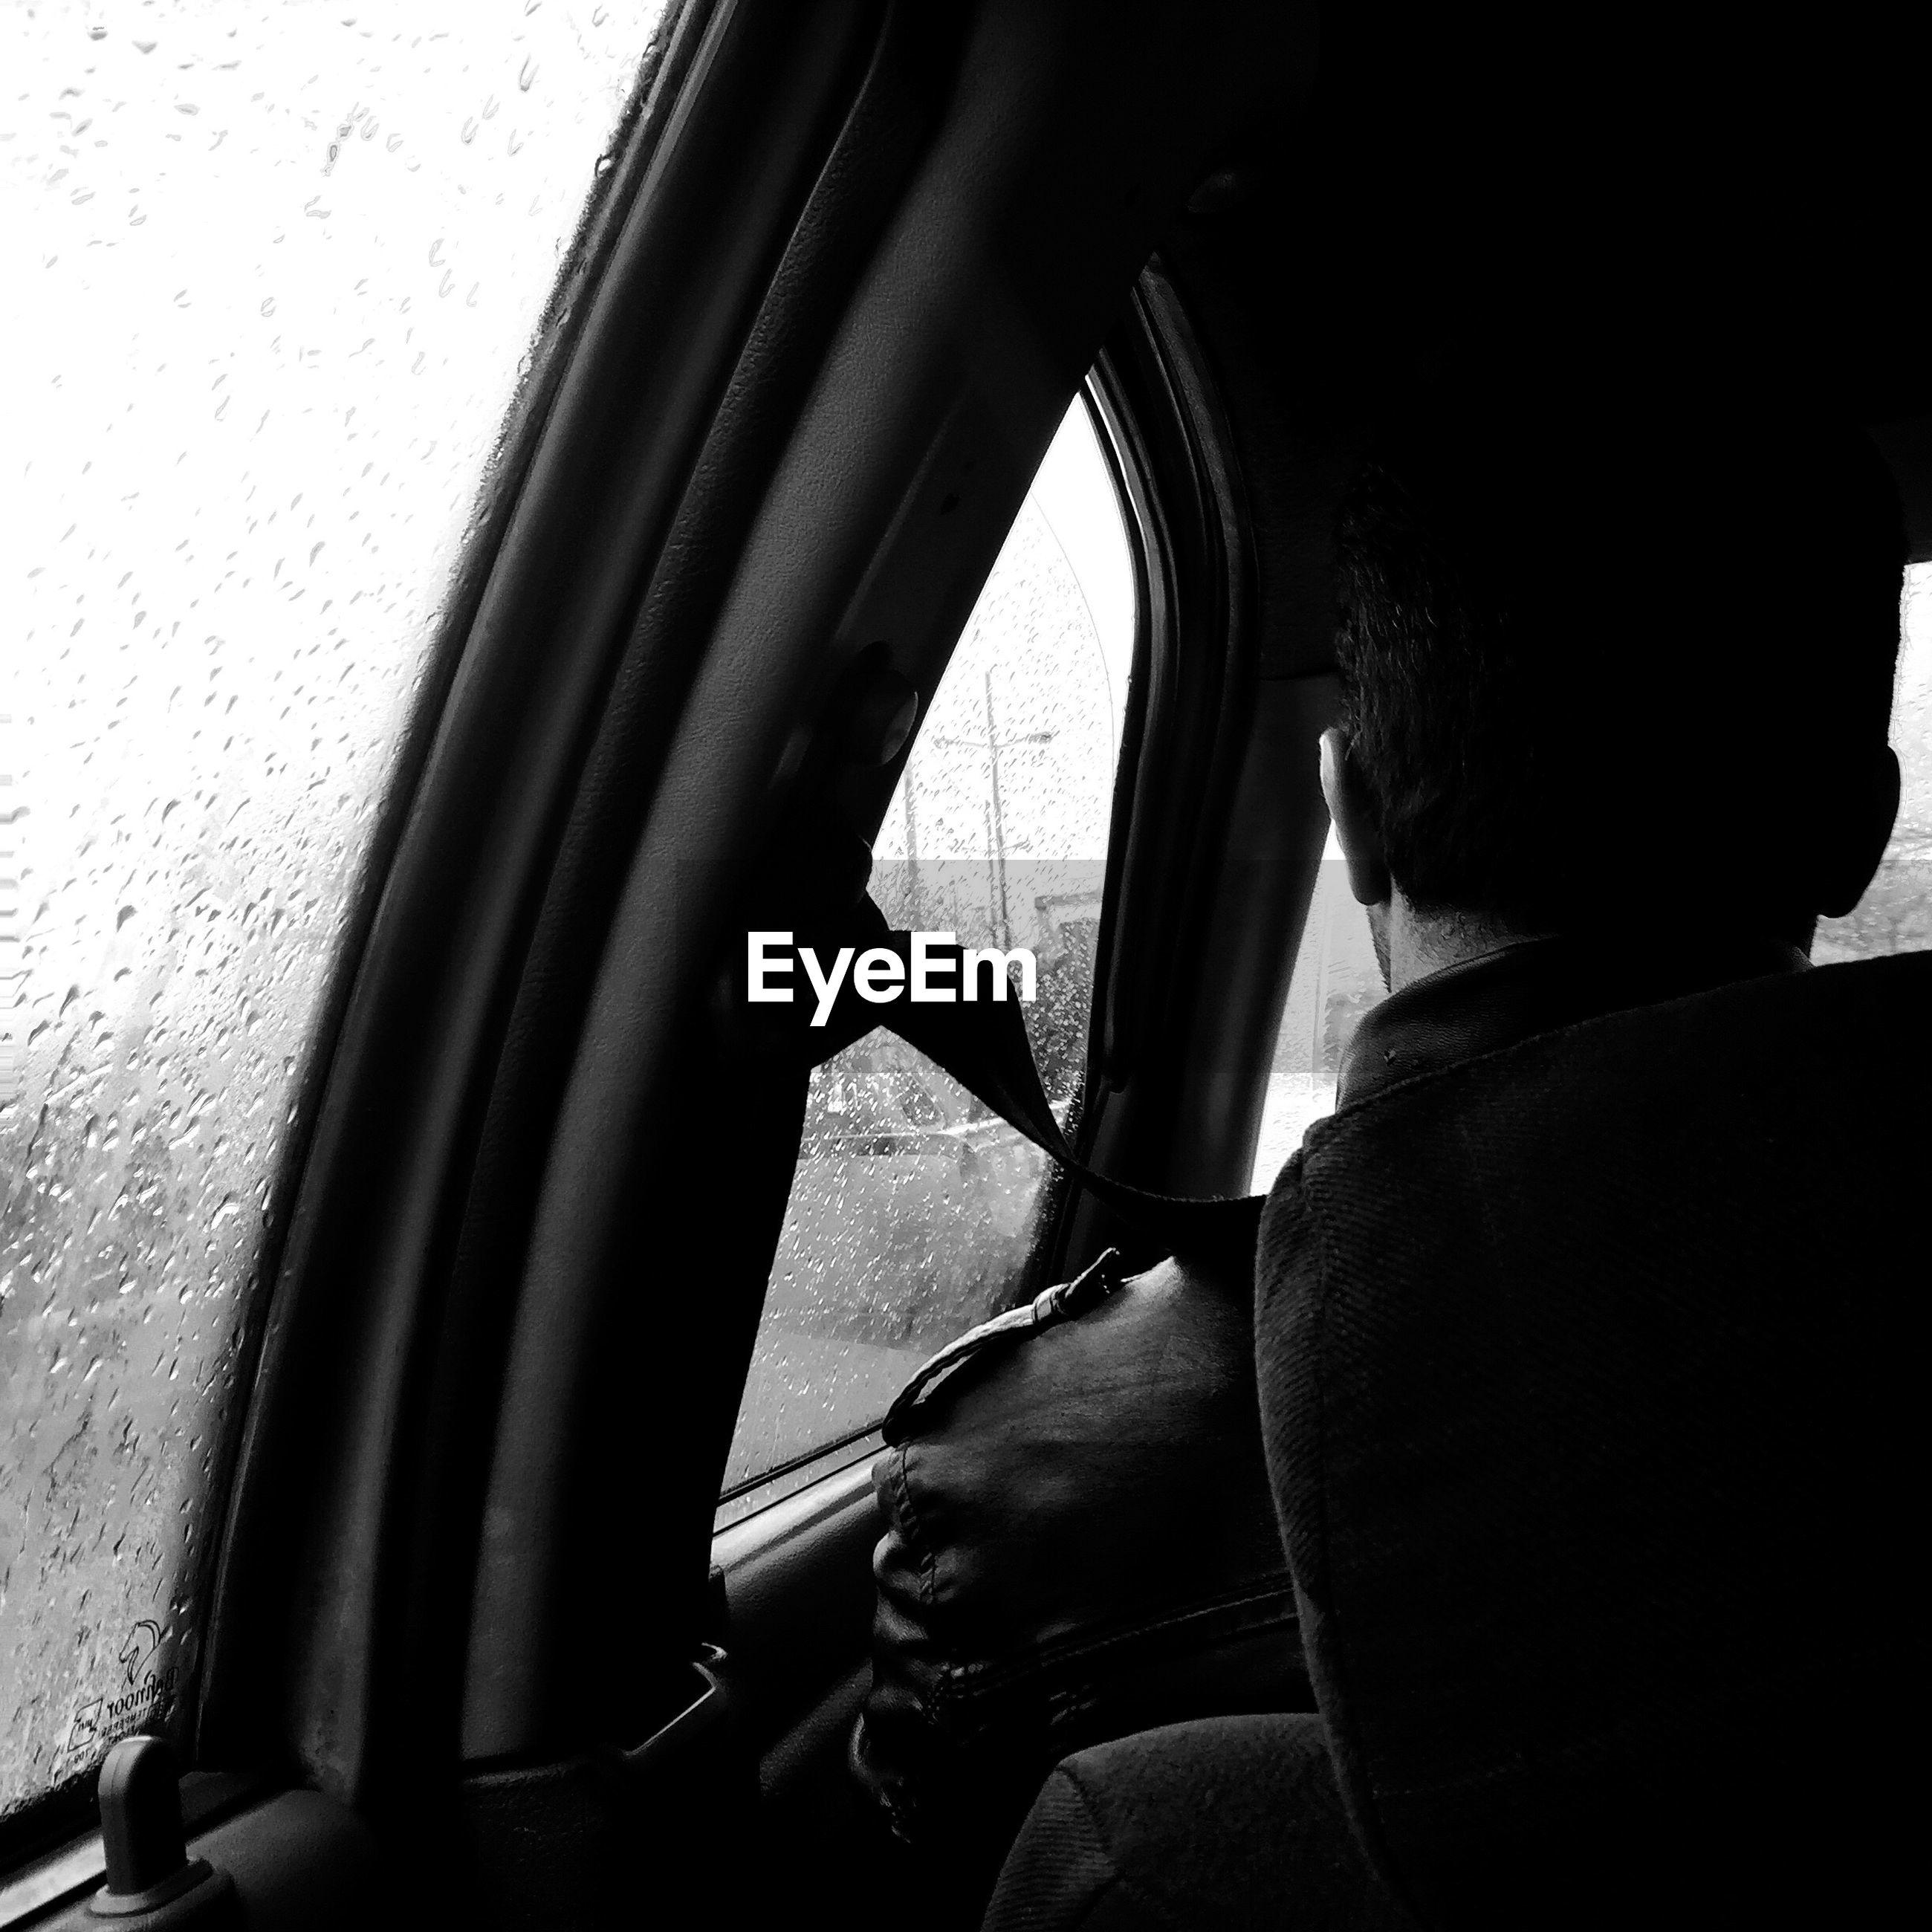 REFLECTION OF MAN SITTING IN CAR WINDOW